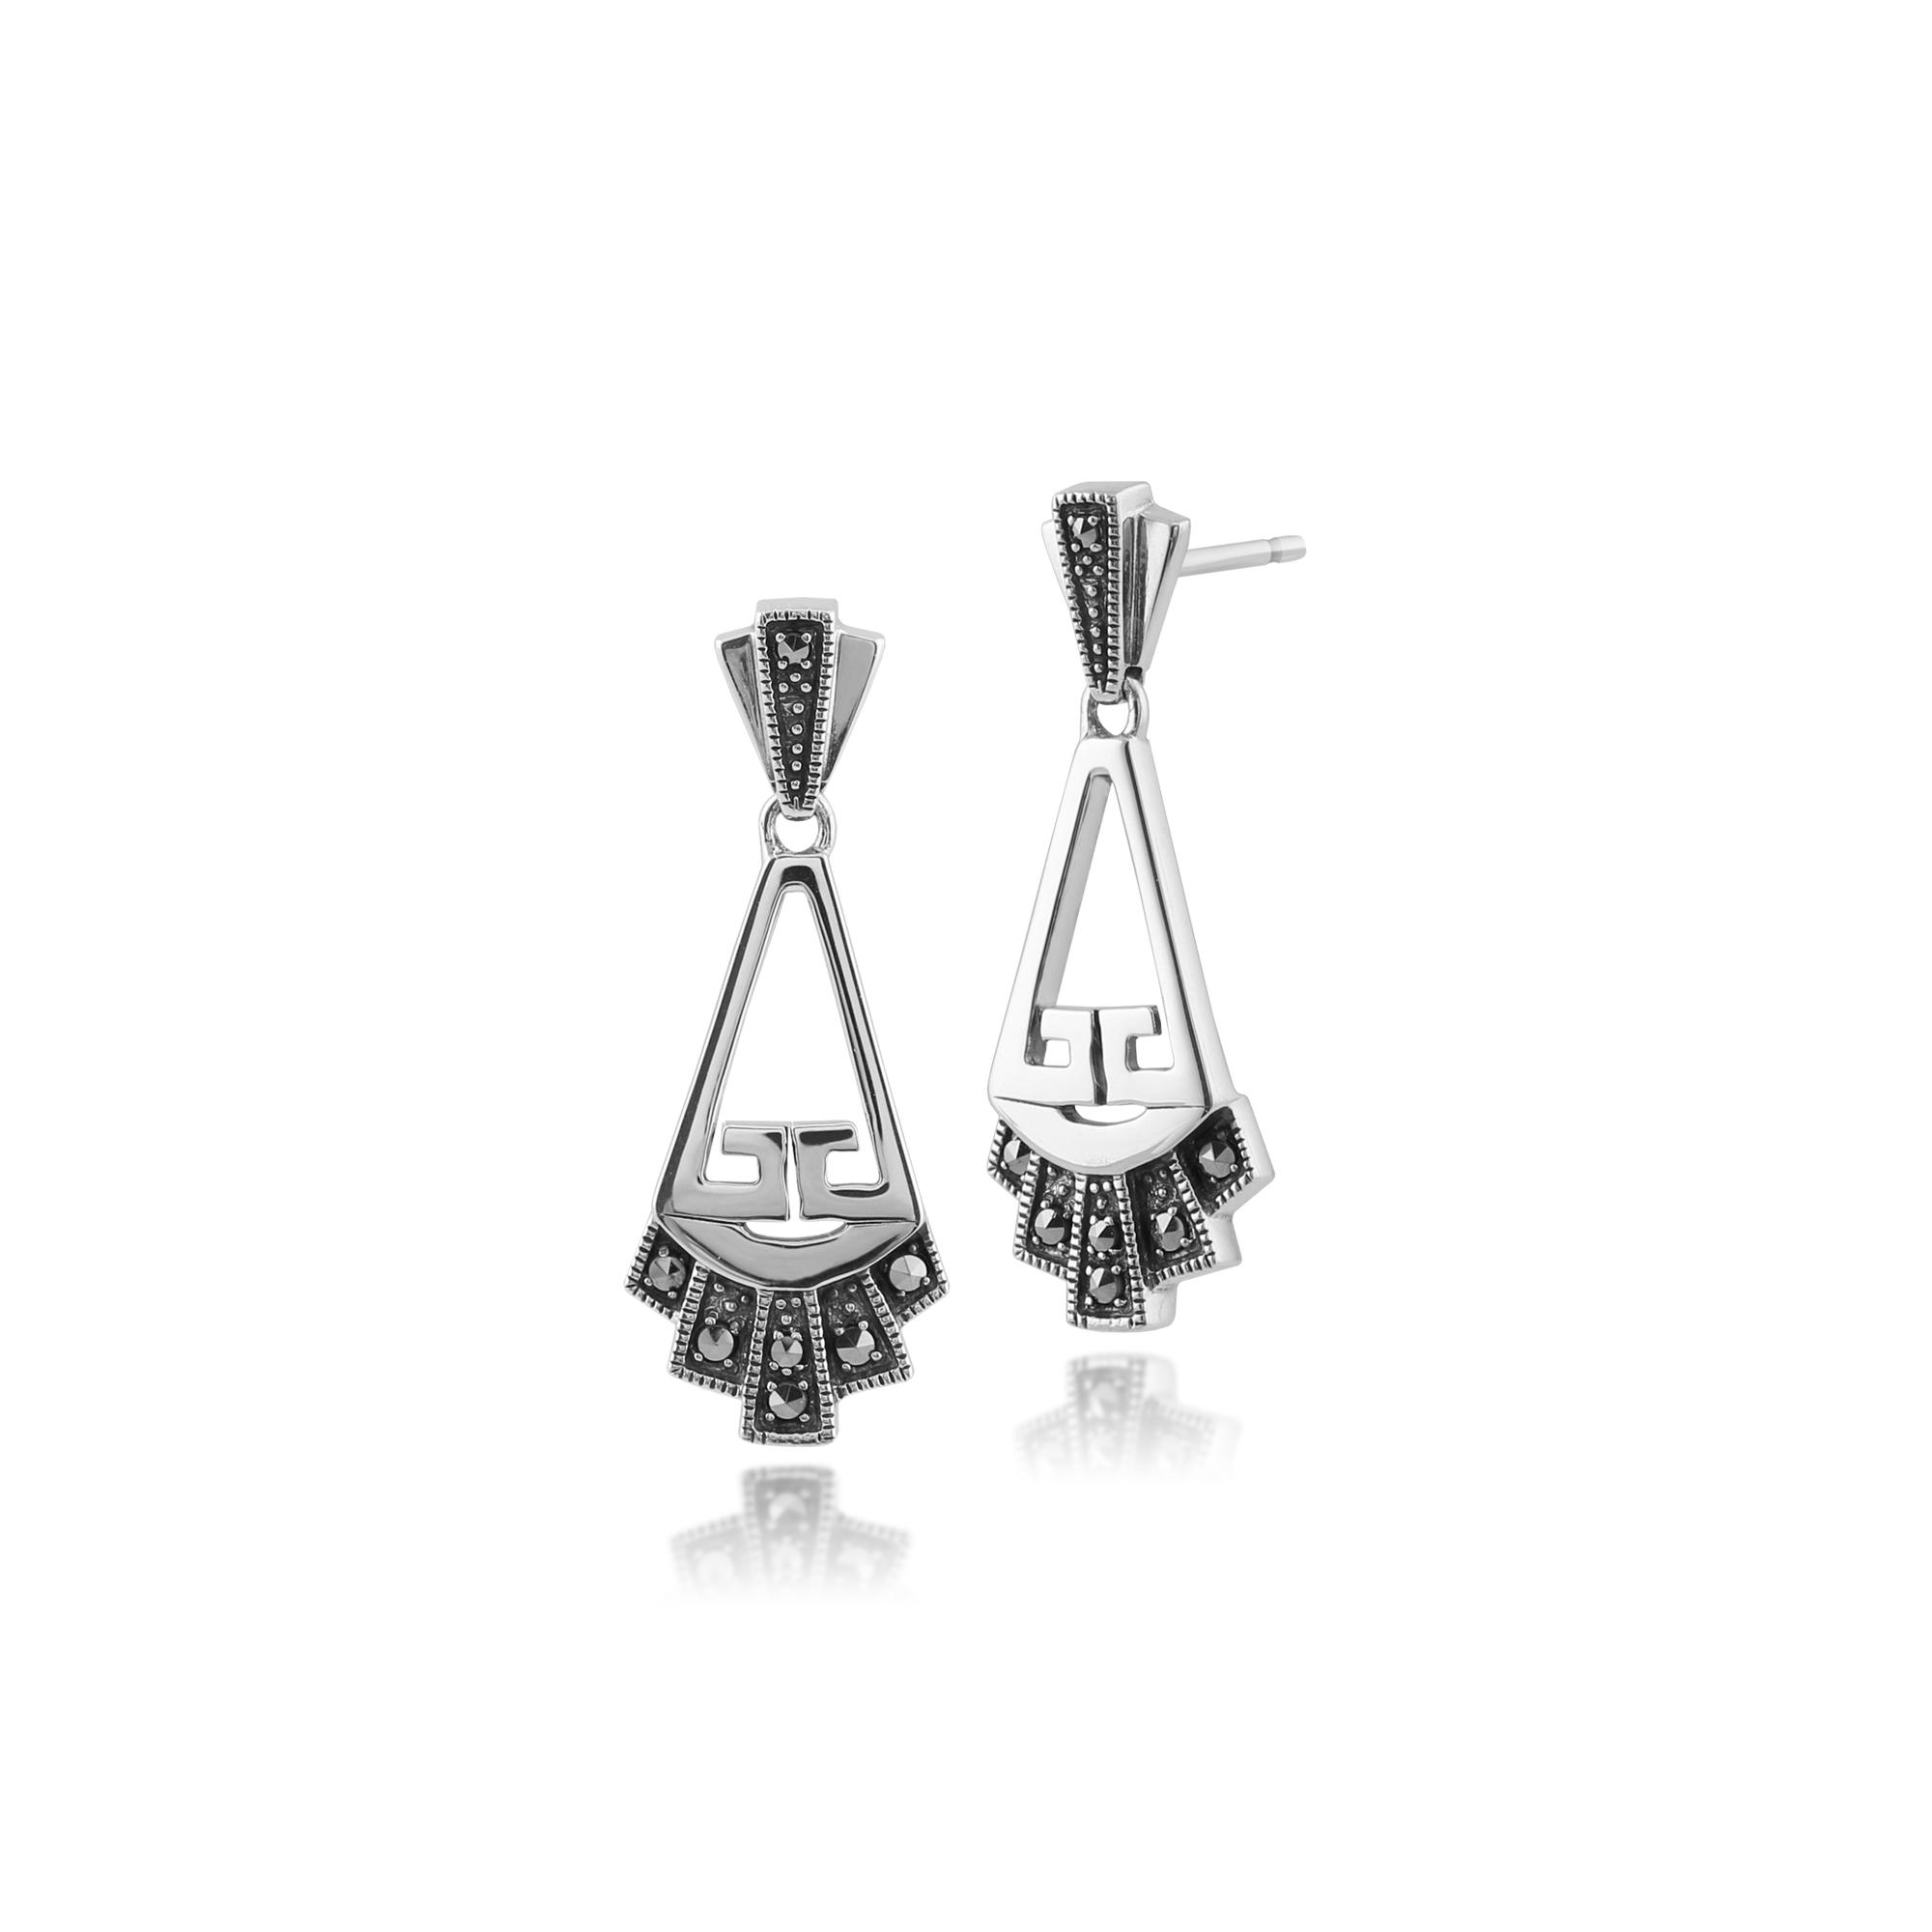 gemondo 925 sterling silver art deco marcasite drop earrings ebay. Black Bedroom Furniture Sets. Home Design Ideas